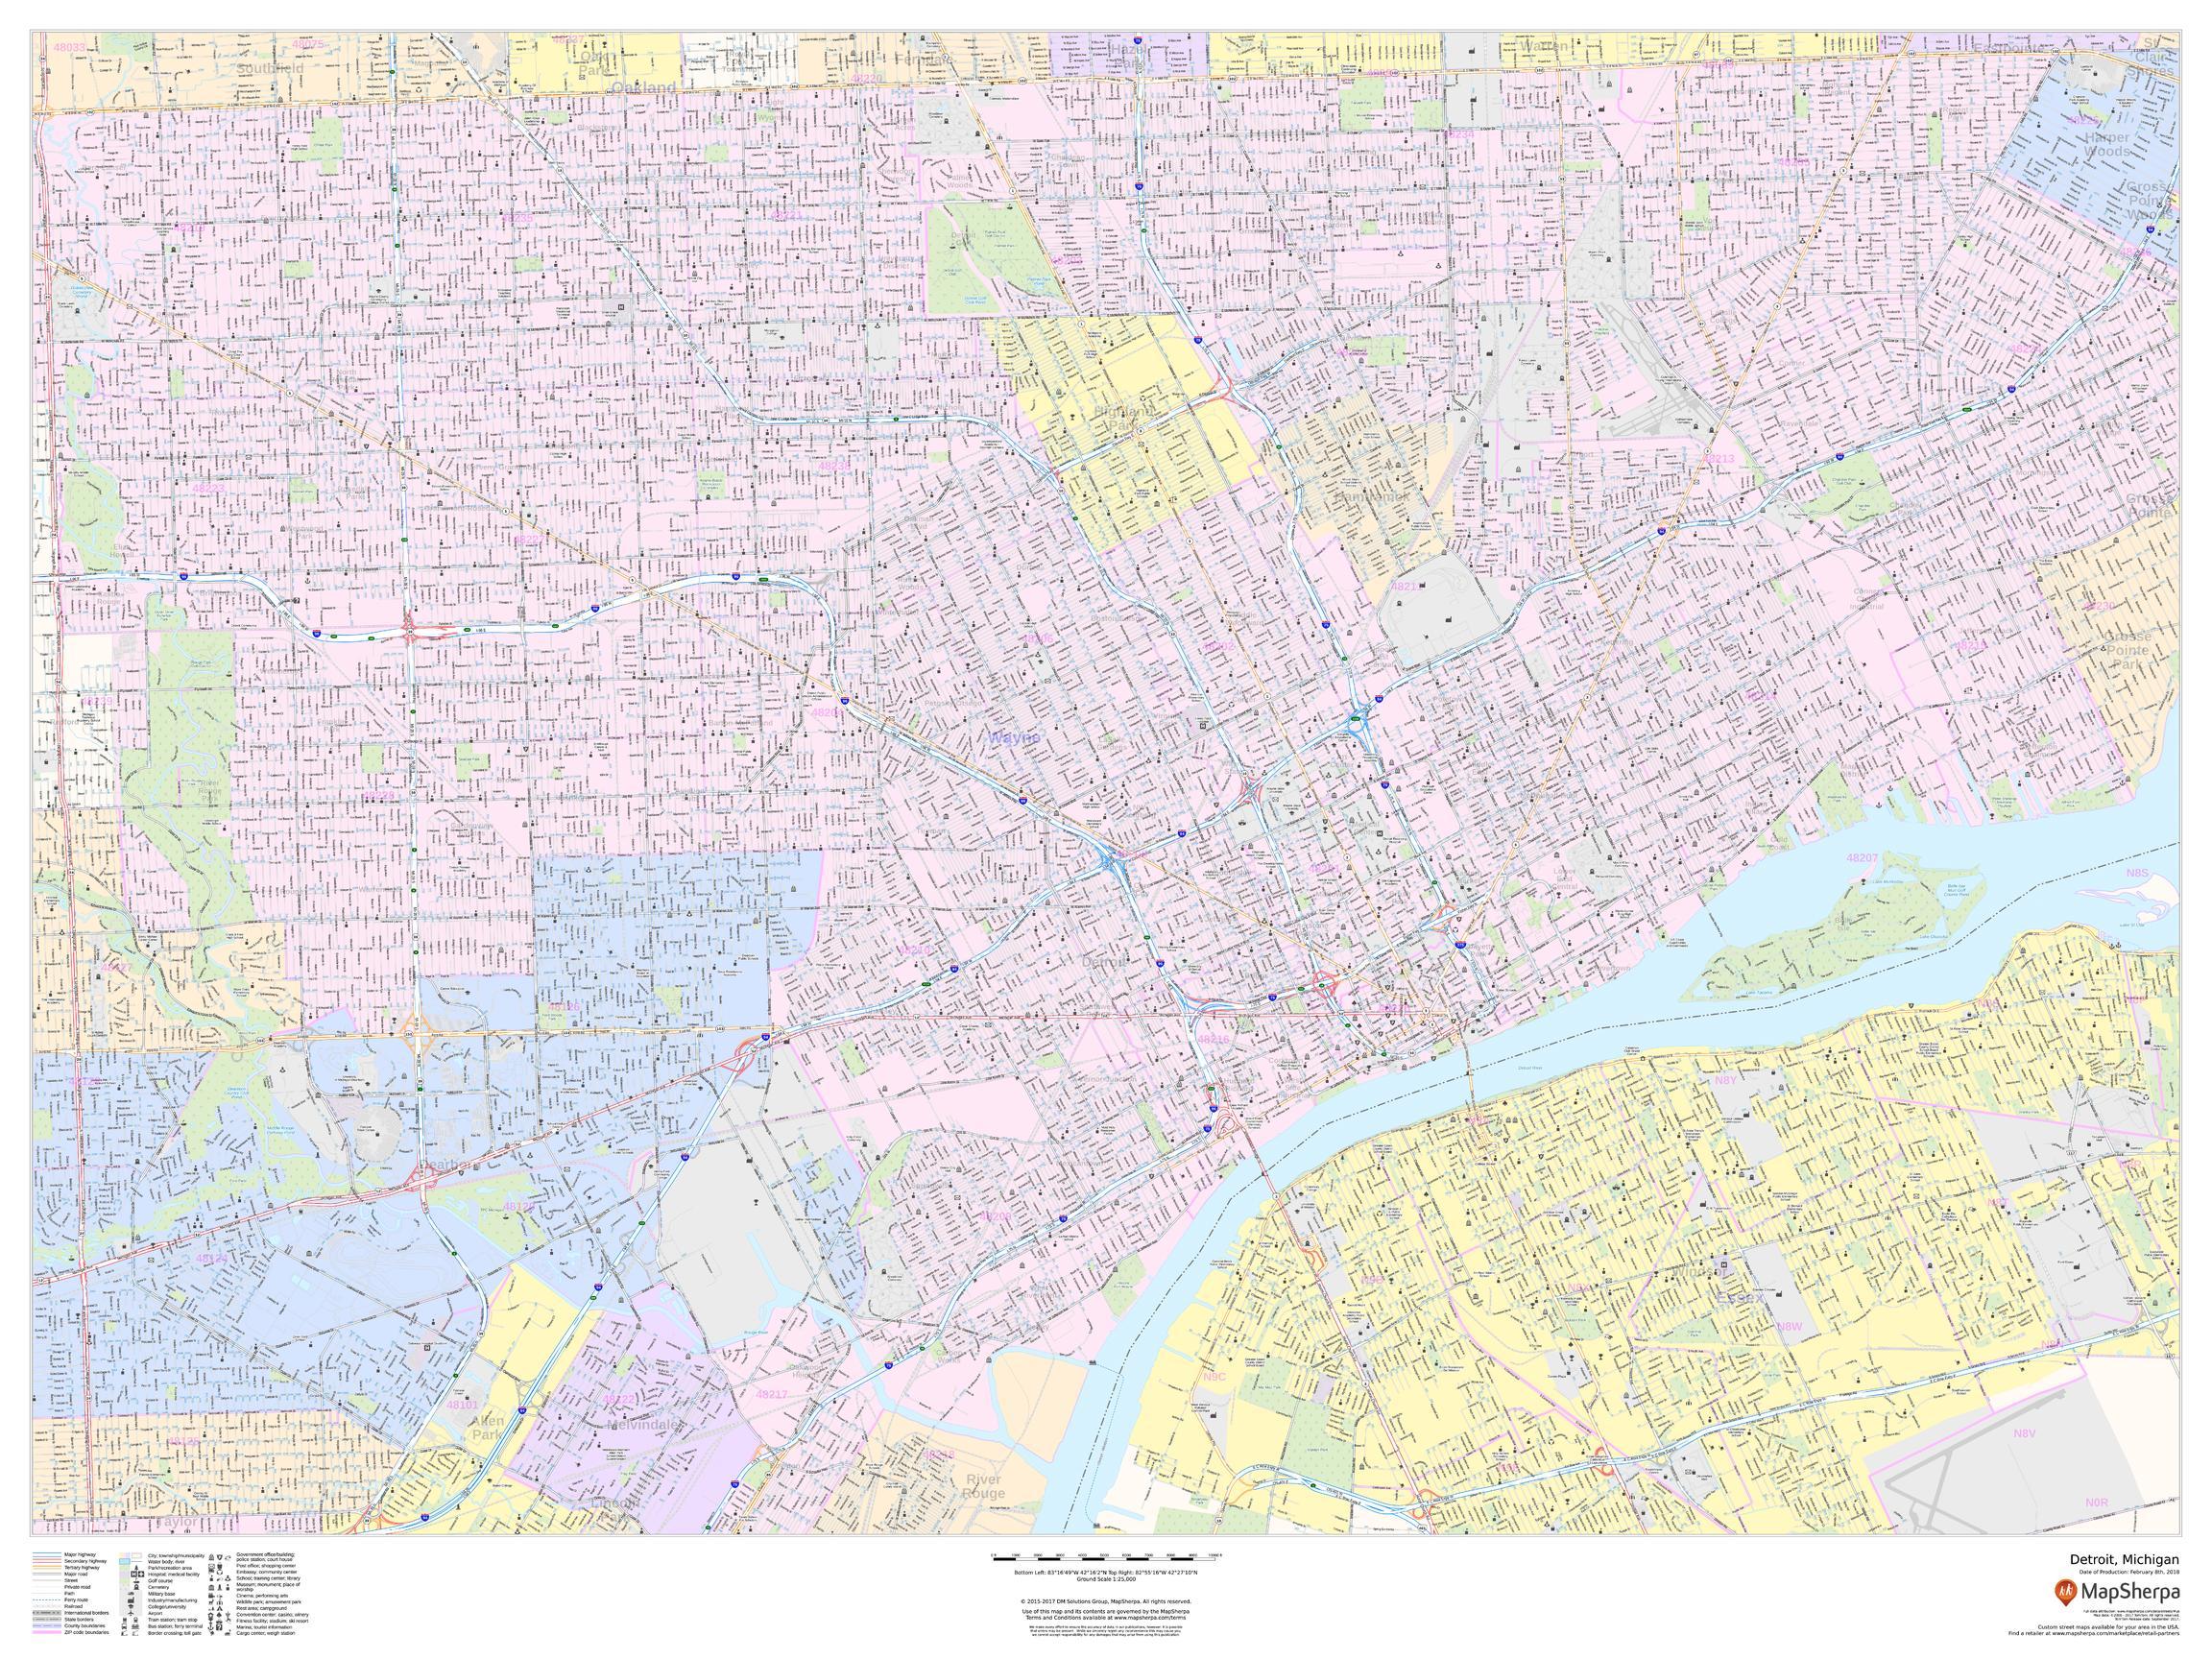 Detroit Map, Michigan - Landscape on map usa dallas, map usa indianapolis, map usa new orleans, map usa san francisco, map usa boston, map usa chicago, map usa san antonio, map usa cleveland, map usa san diego, map usa new york, map usa baltimore, map usa philadelphia, map usa michigan, map usa atlanta,